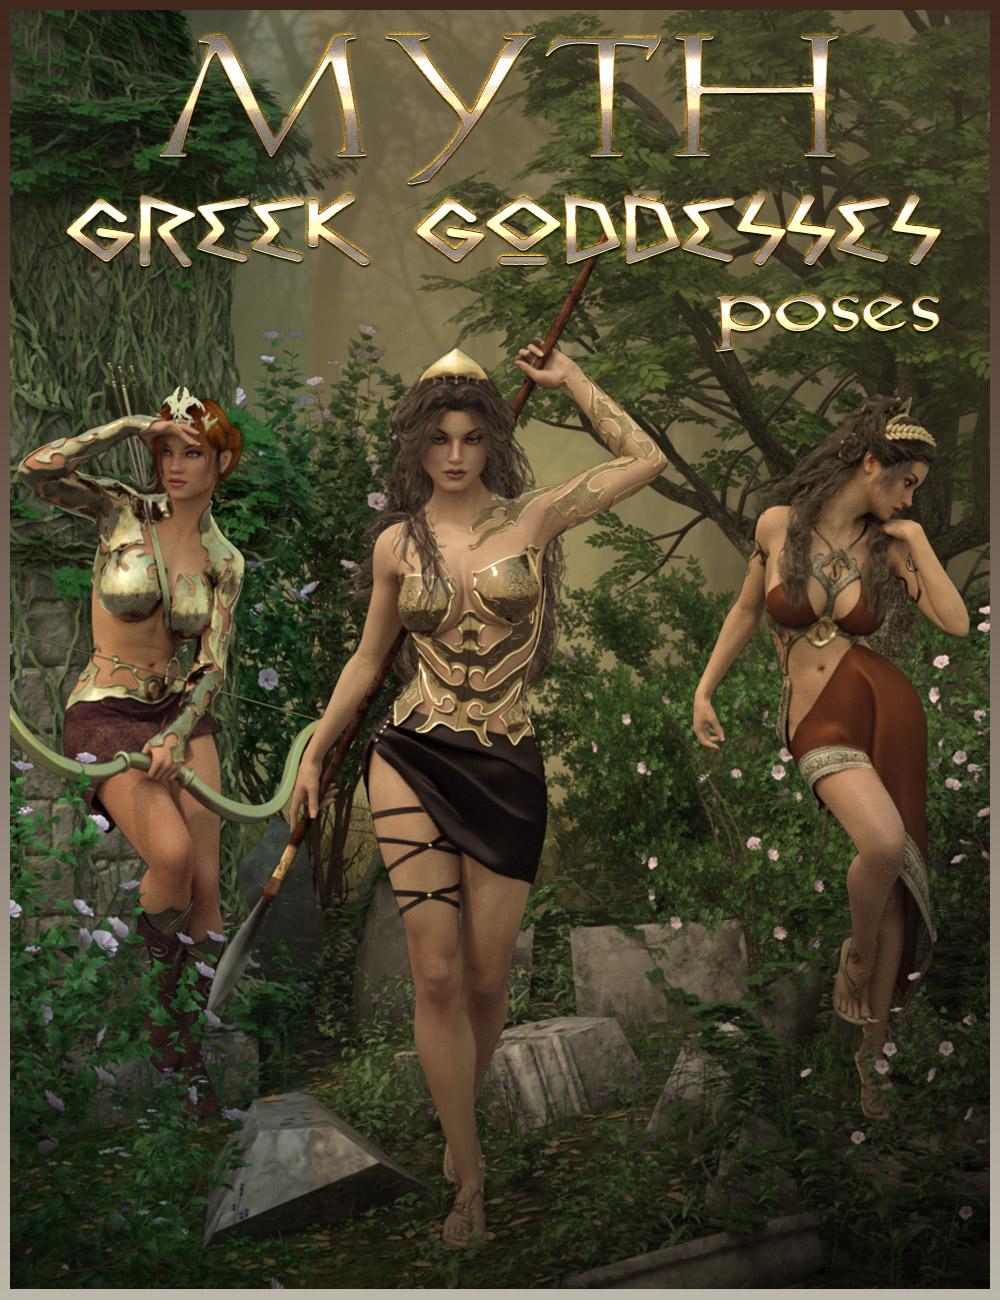 MYTH - Greek Goddesses Poses by: ilona, 3D Models by Daz 3D